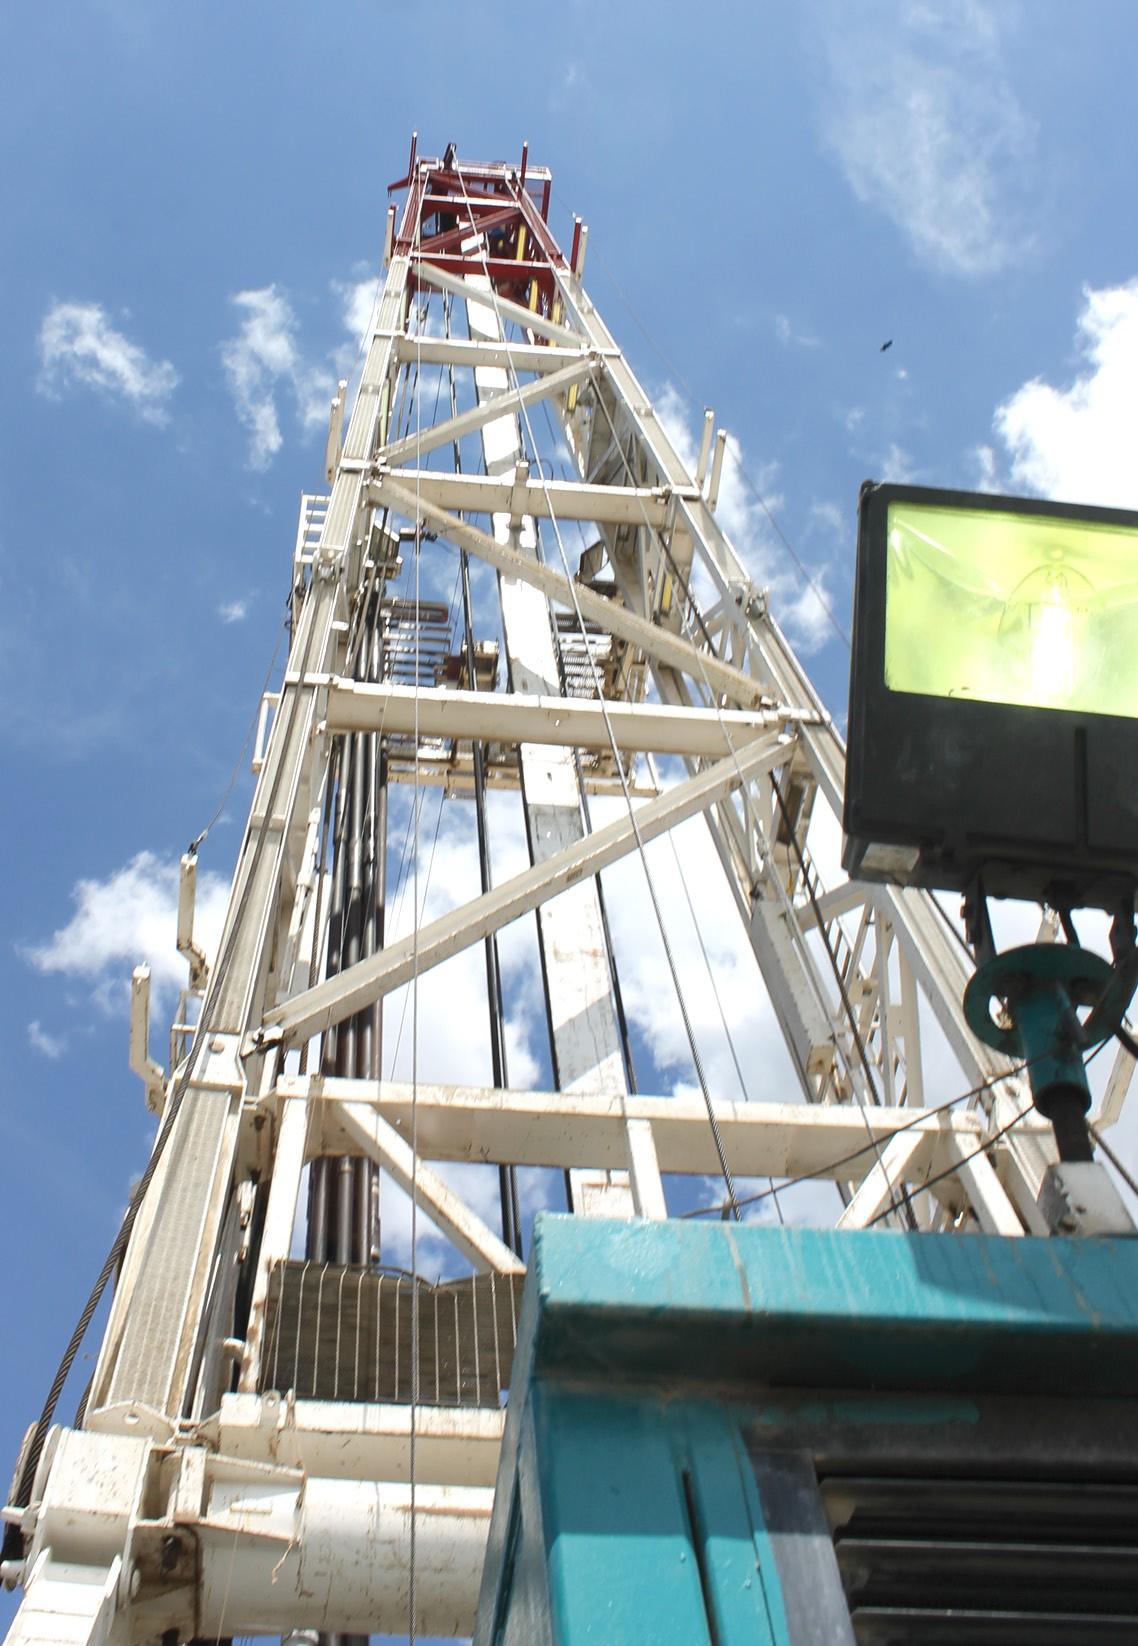 Skyward view of Trinidad Drilling Rig 123E derrick at Abraxas Petroleum Austin Chalk horizontal site south of Pleasanton.